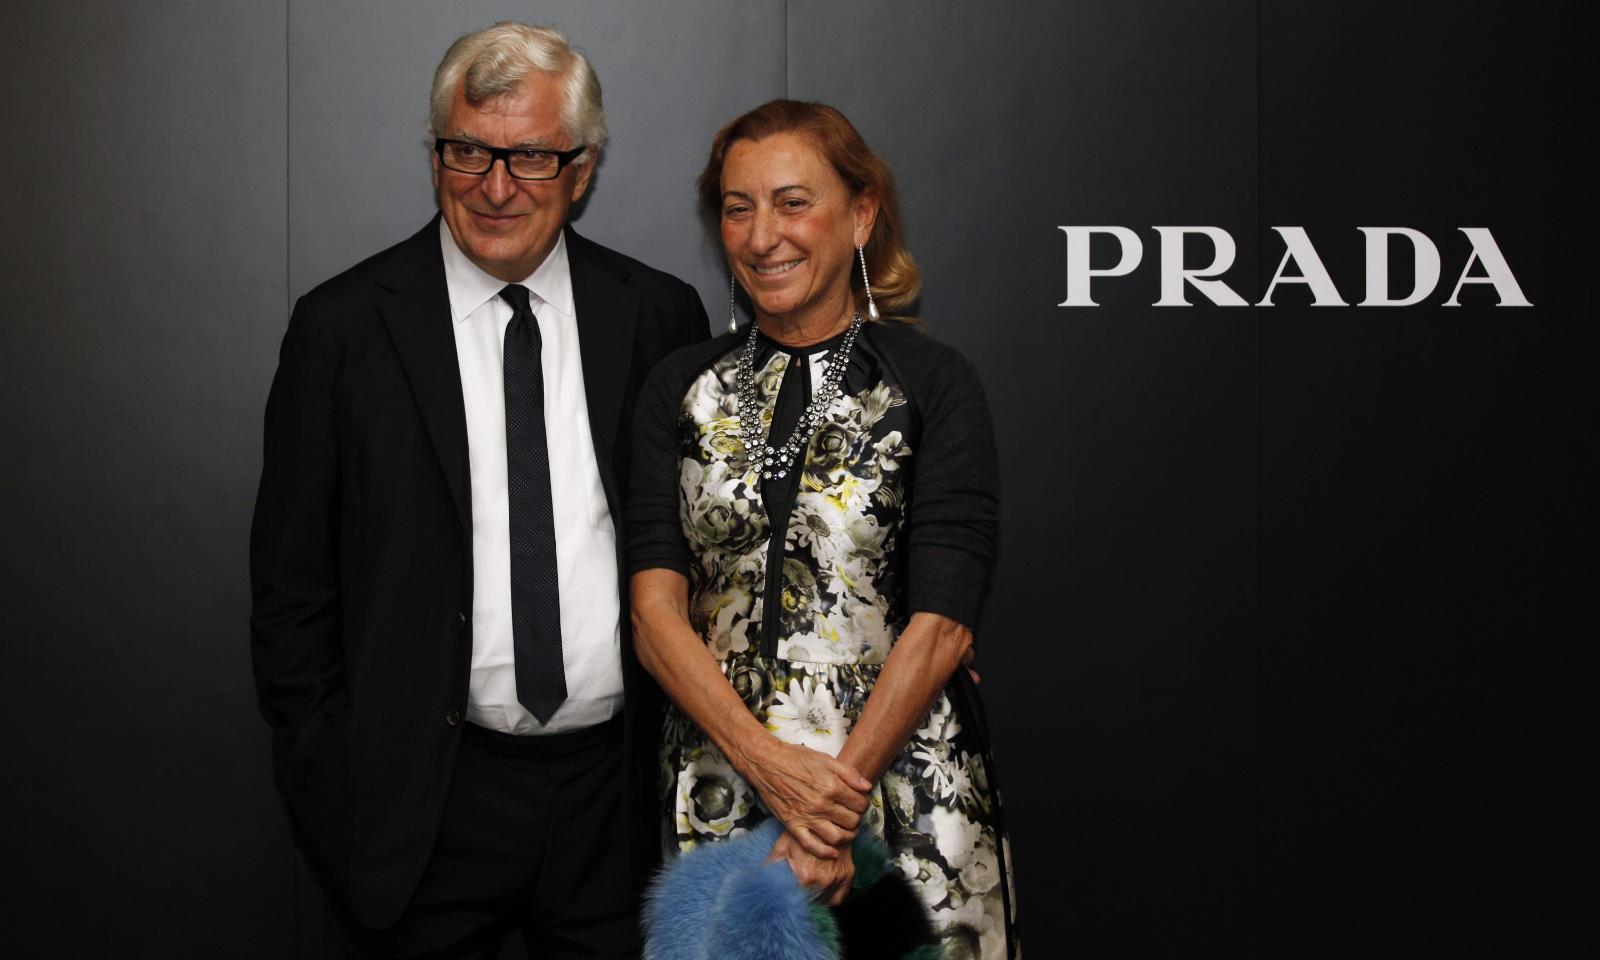 Prada 集团意大利工厂转为生产防护服与医用口罩